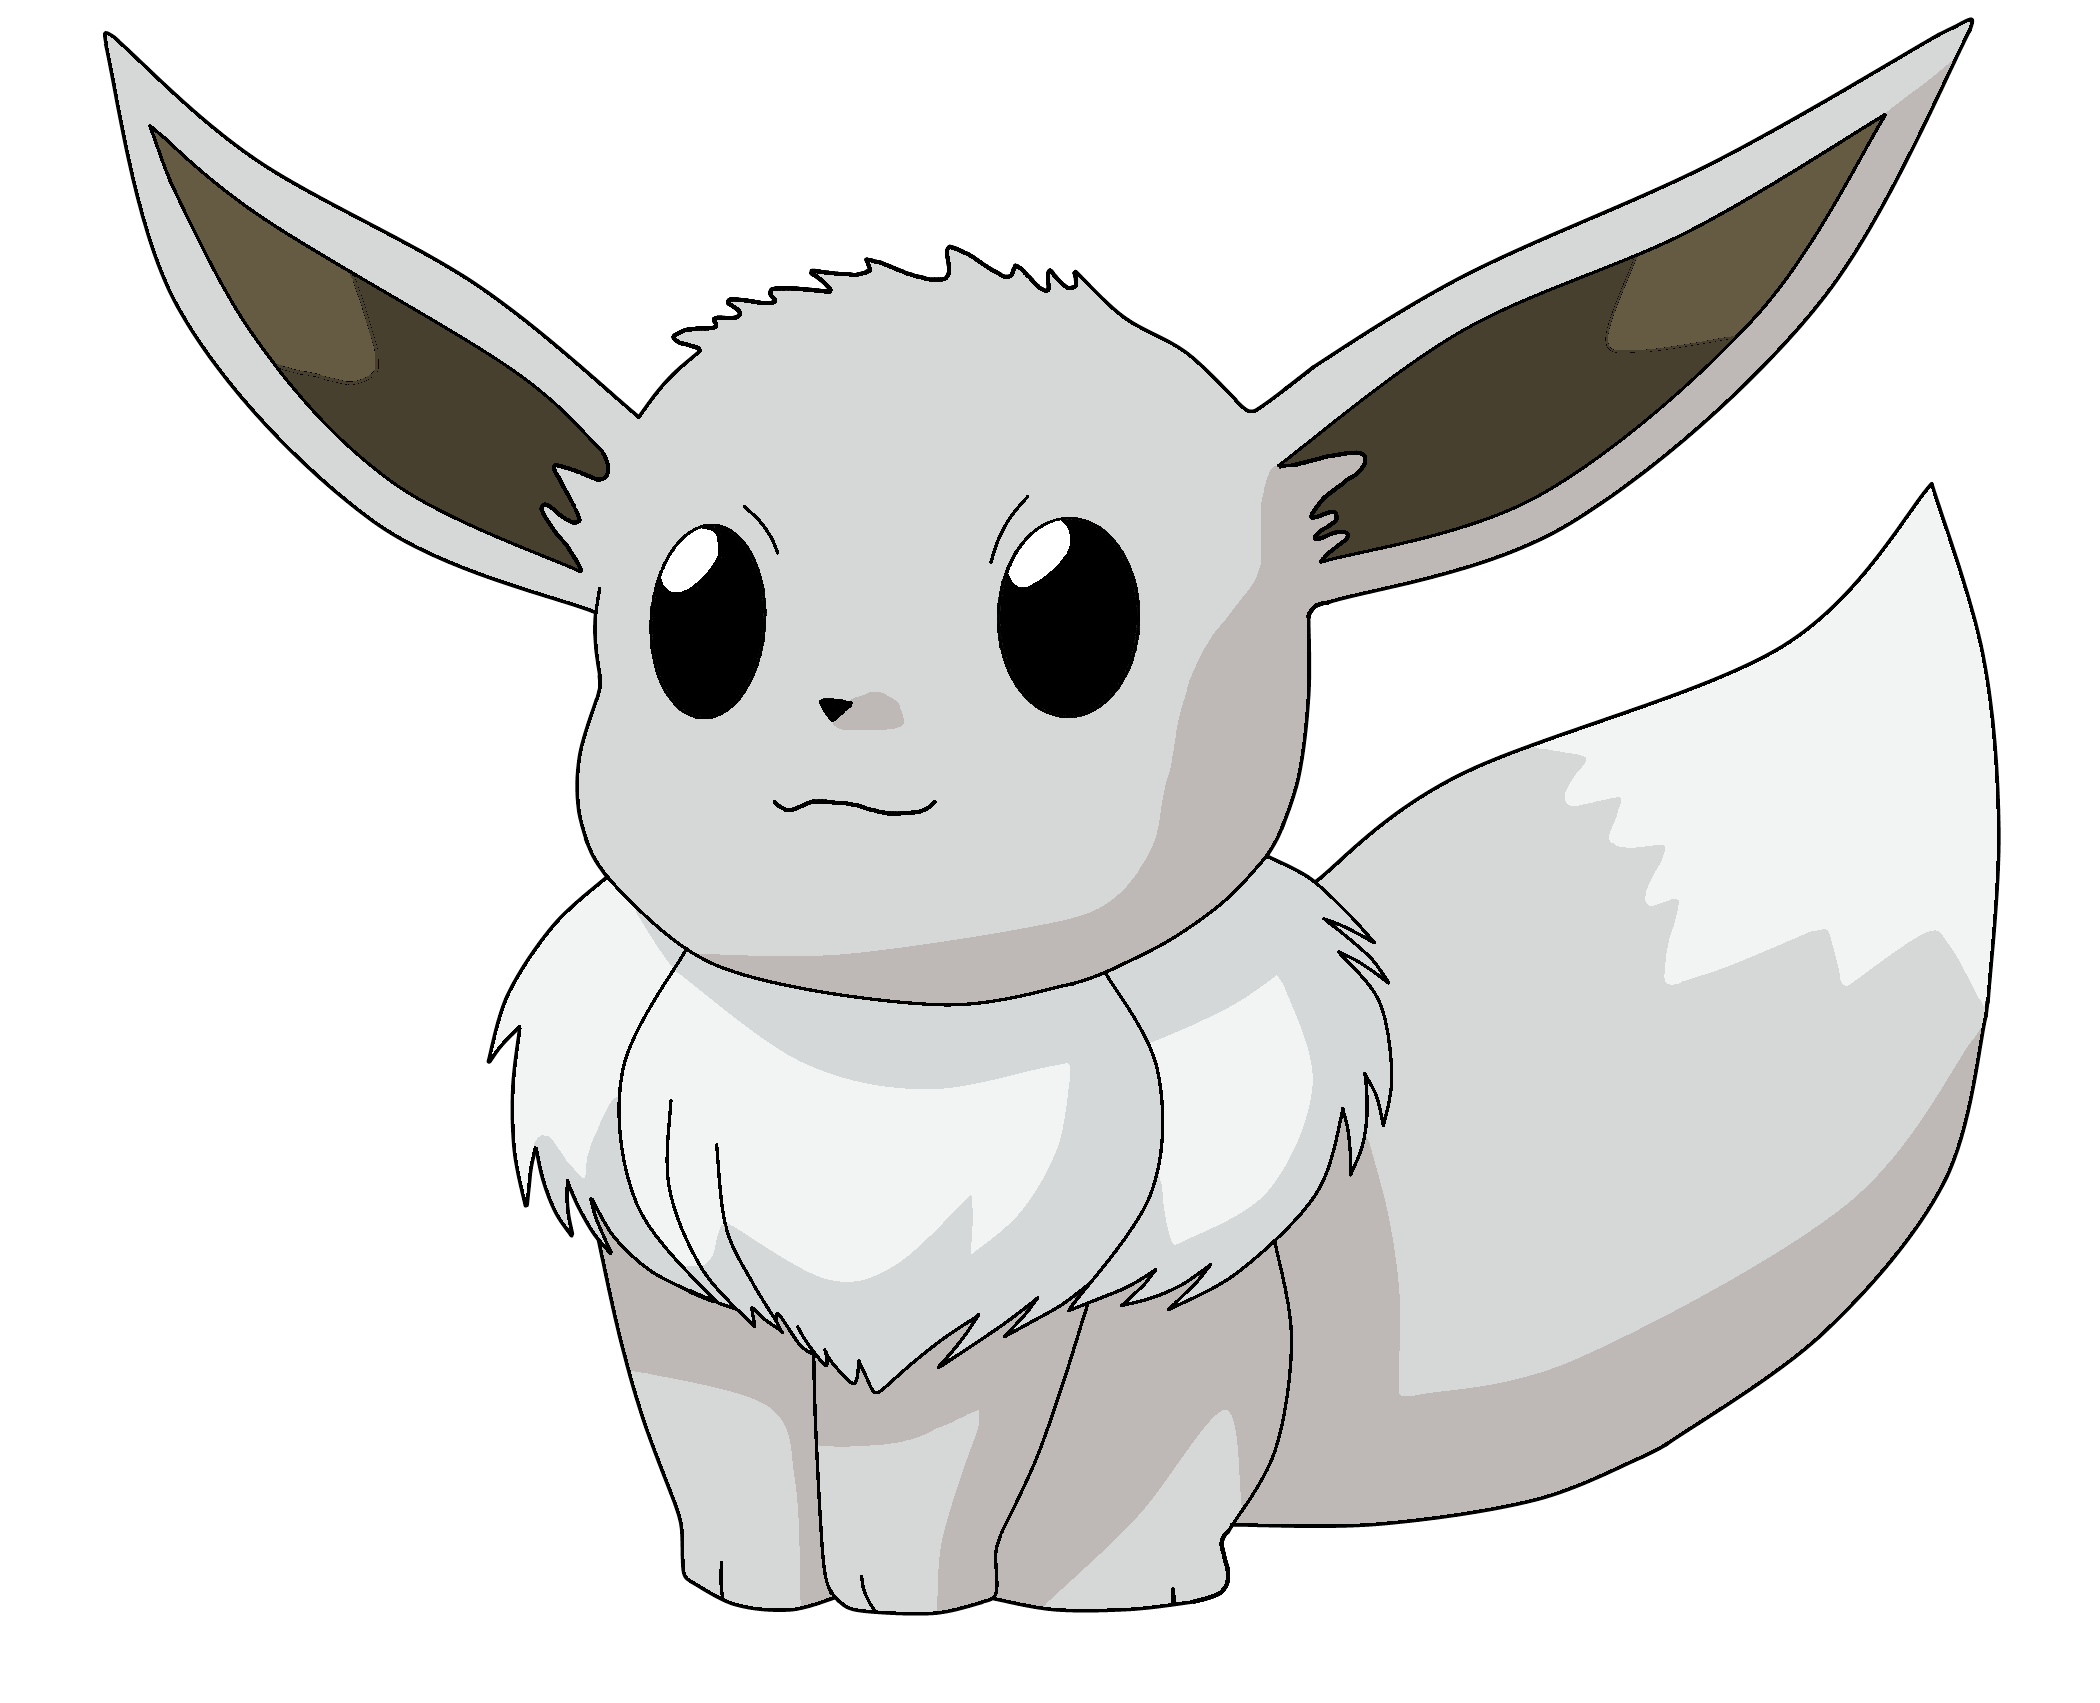 Pokemon evoli 133 lineart farbig shiny by wallpaperzero on - Pokemon noir 2 evoli ...